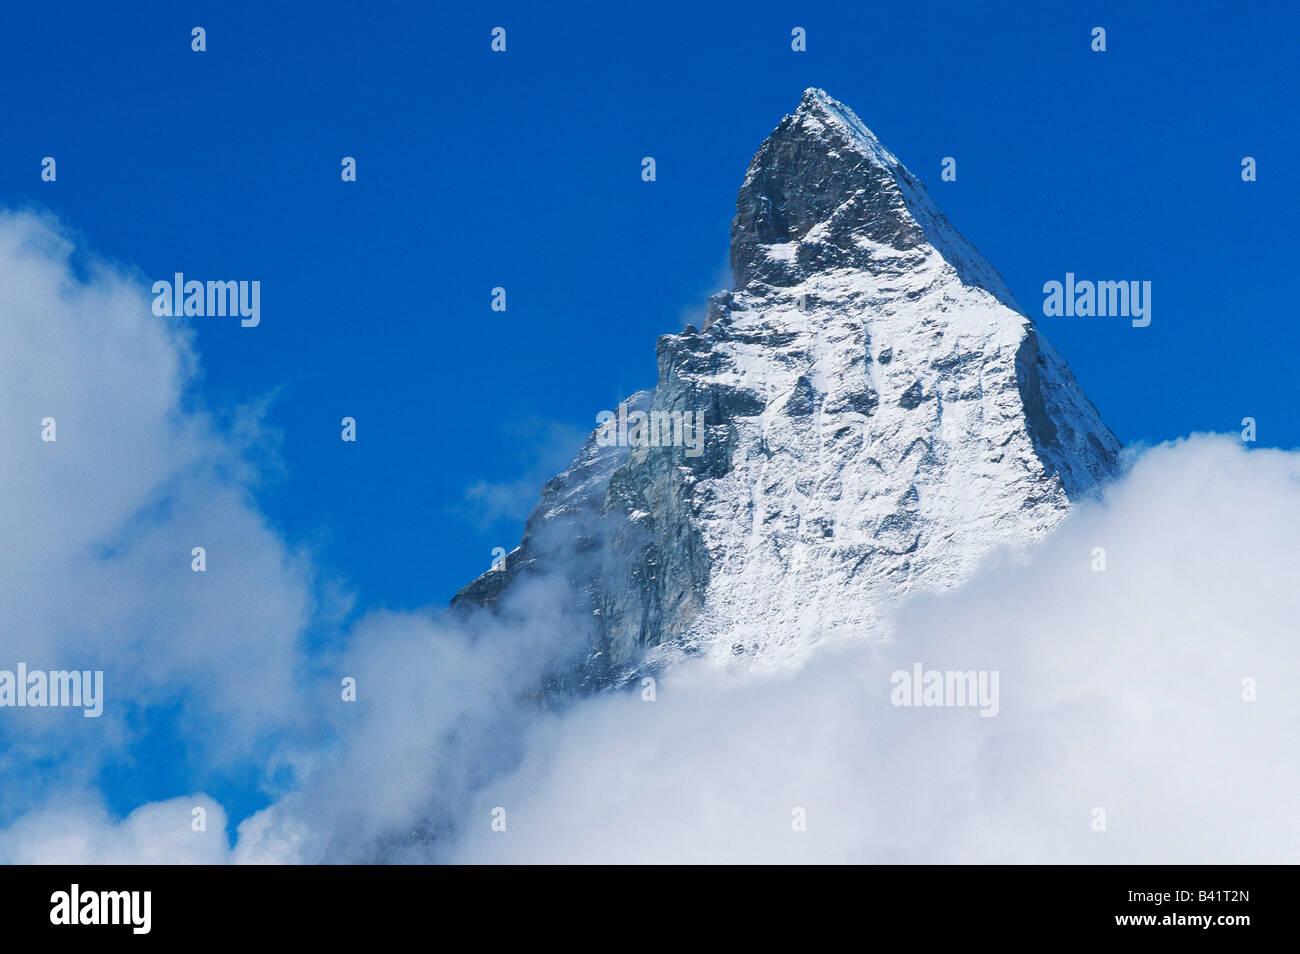 Matterhorn peak Zermatt Valais Switzerland - Stock Image